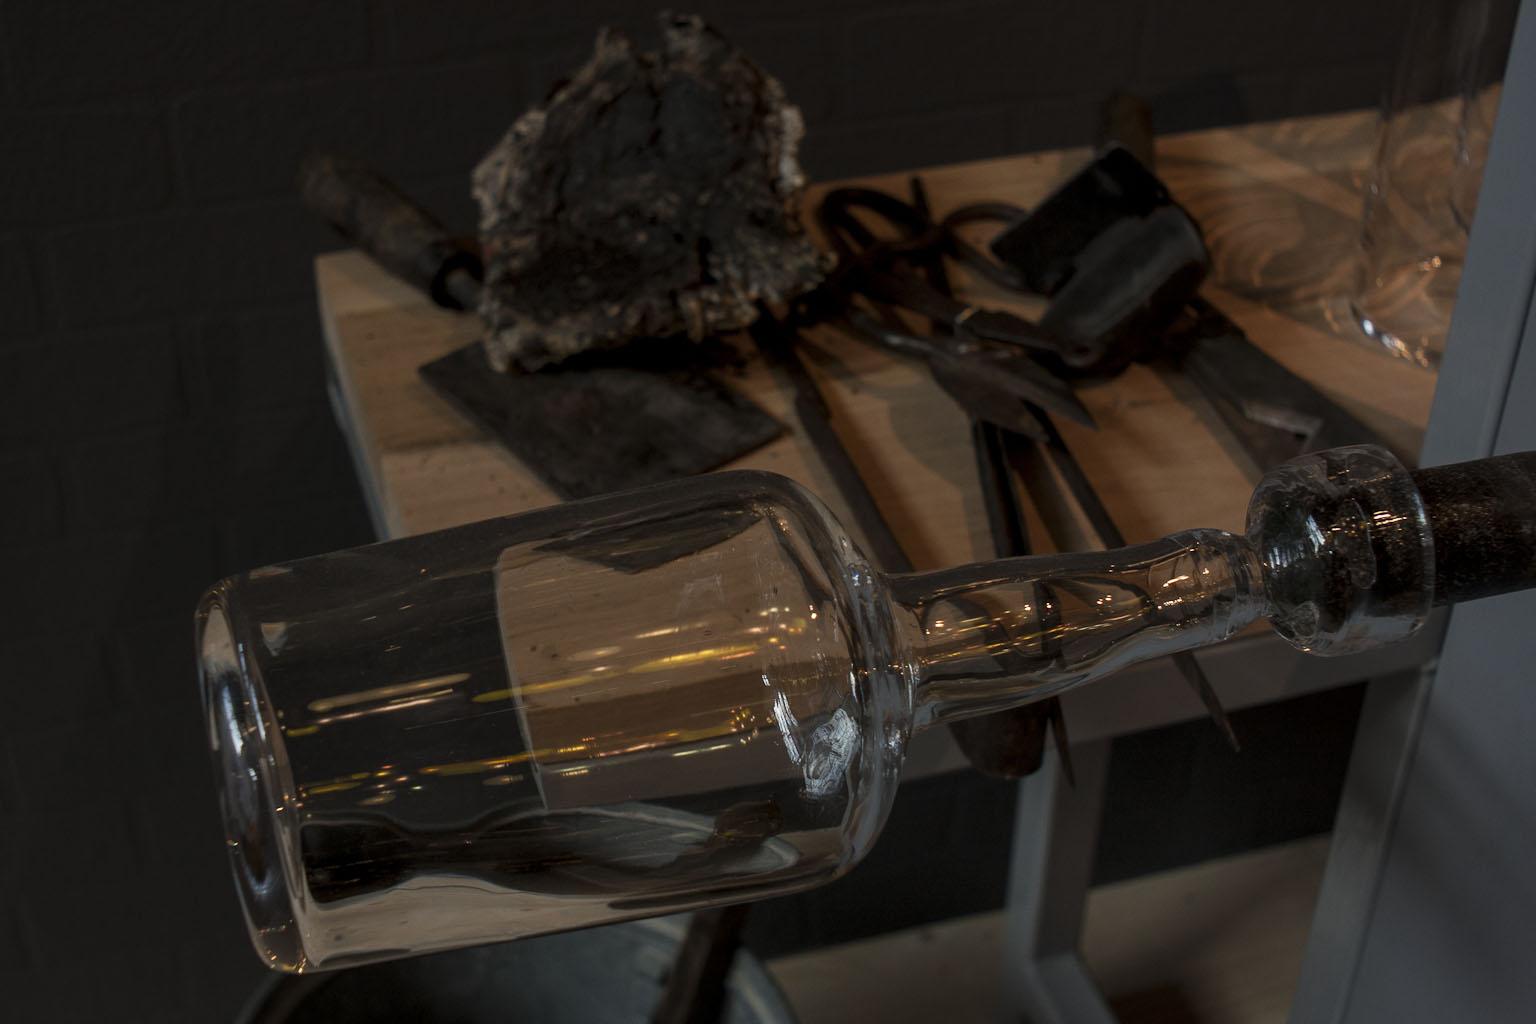 Fusion libre - Craft - Atelier verre